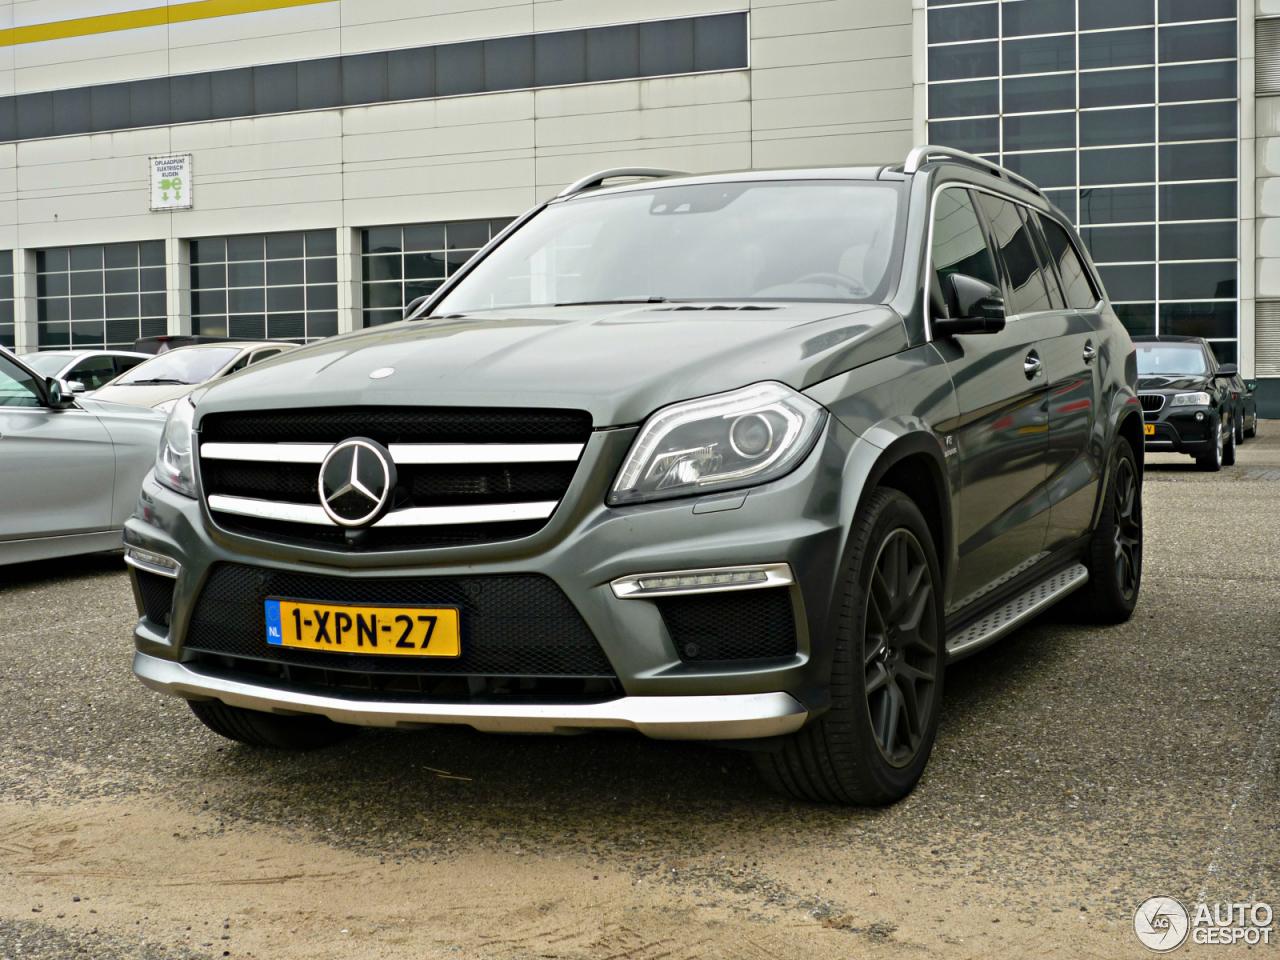 Mercedes benz gl 63 amg x166 18 november 2016 autogespot for 2016 mercedes benz gl